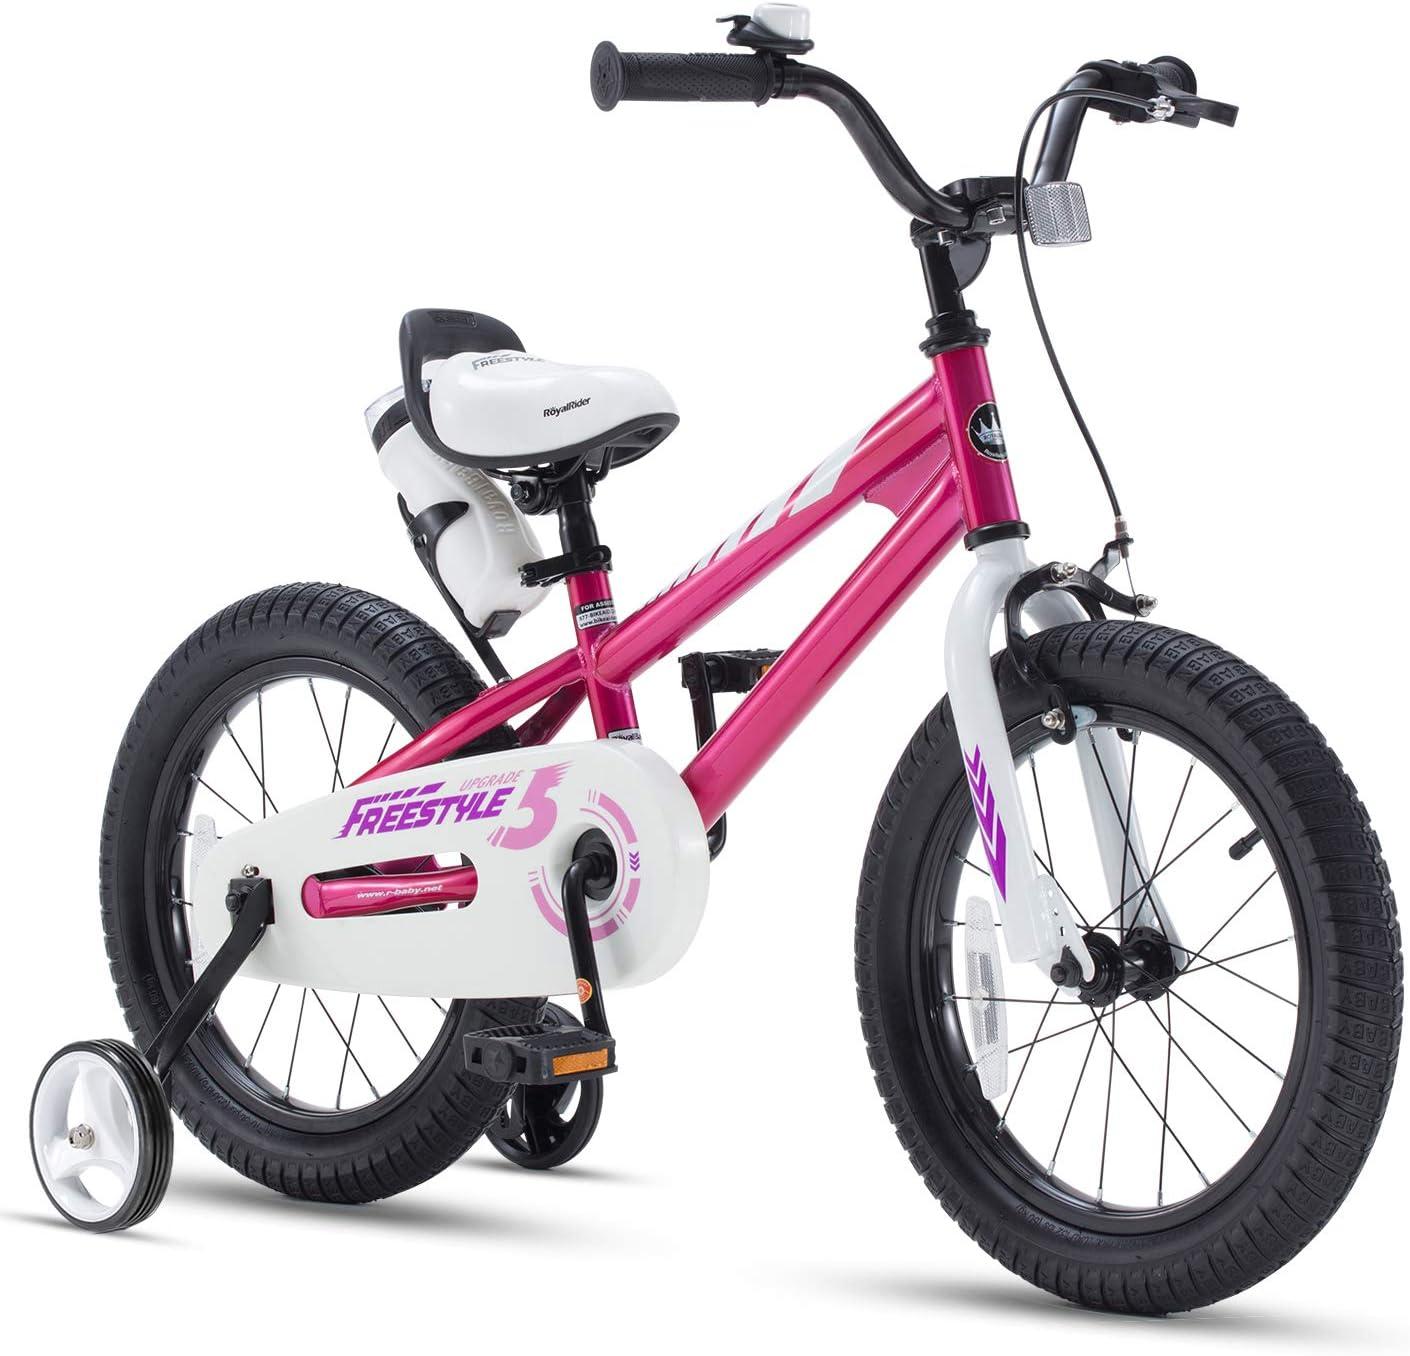 RoyalBaby お金を節約 Kids Bike Boys Girls Freestyle 16 年間定番 w Inch 12 Bicycle 14